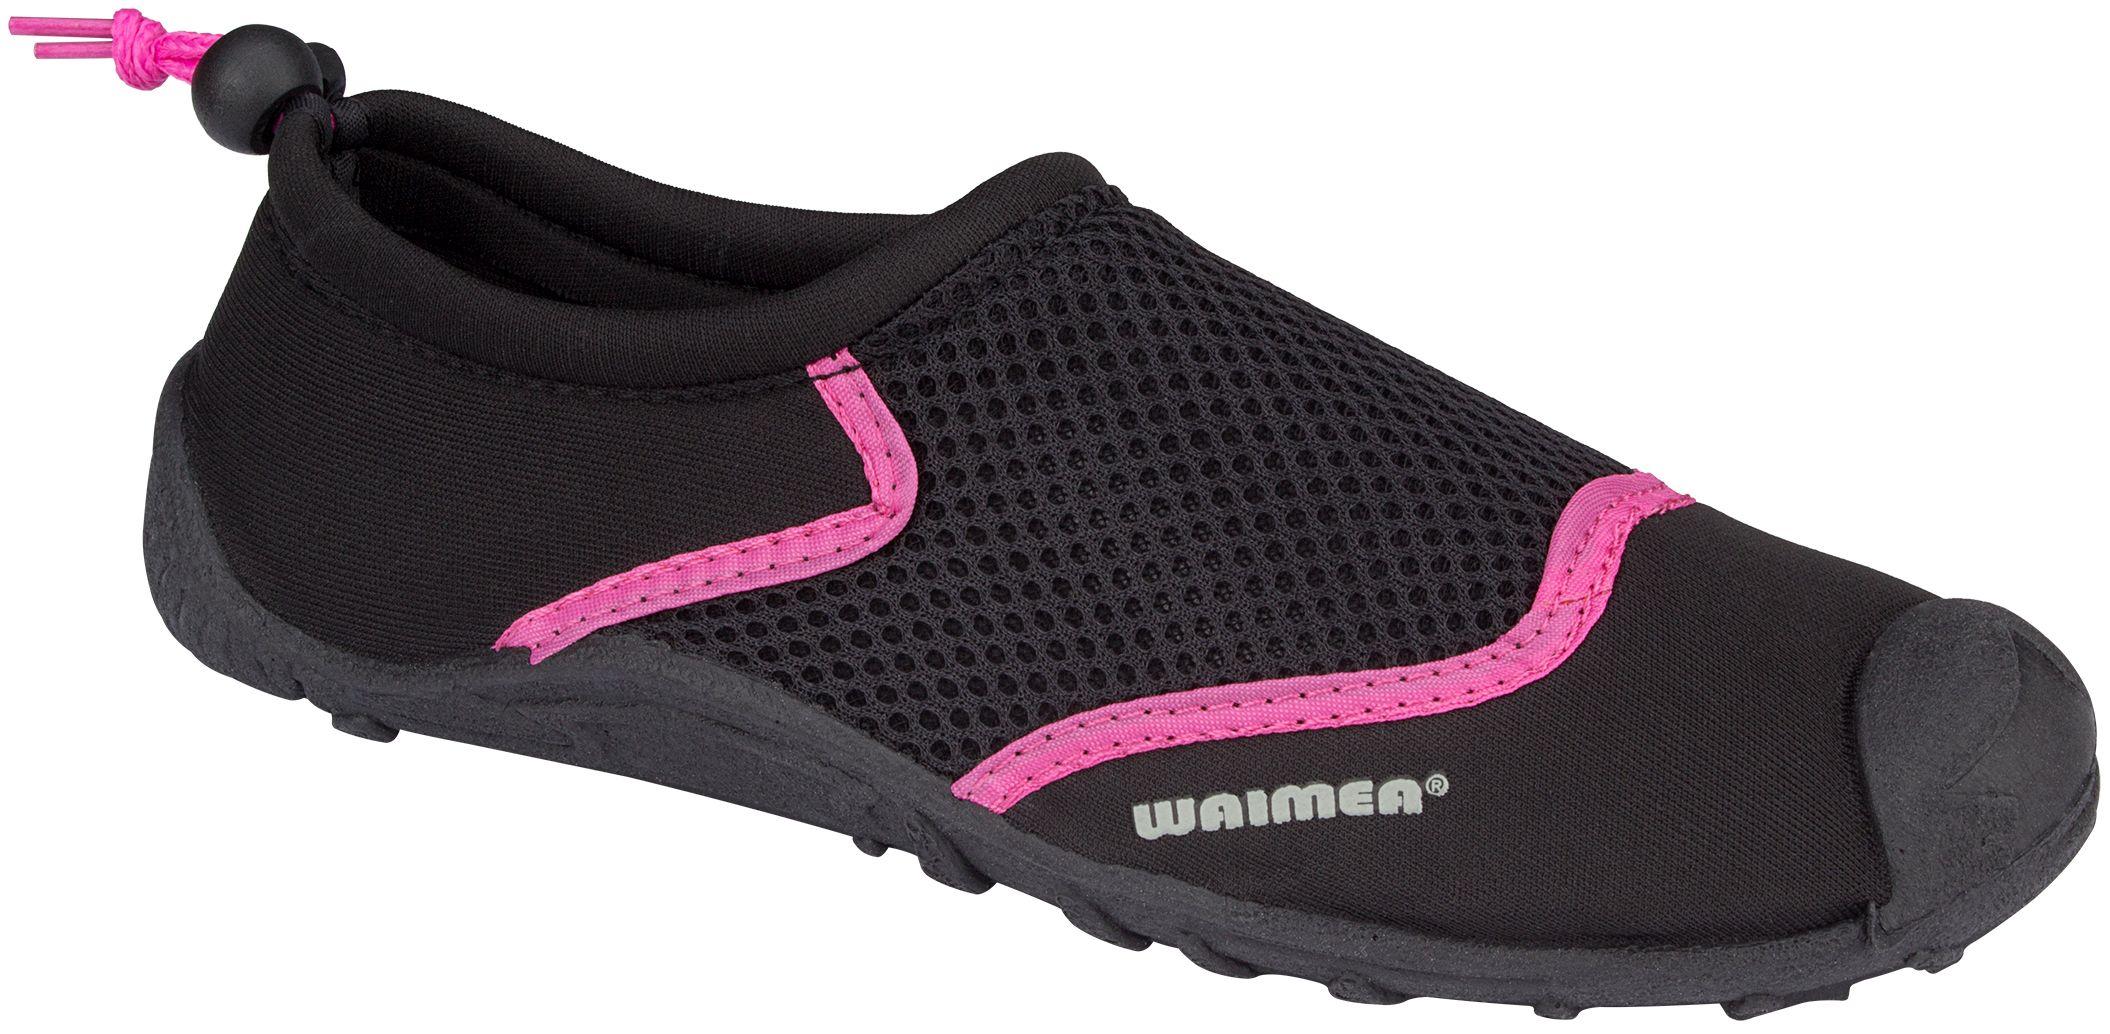 Aquaschoenen • Wave Rider •